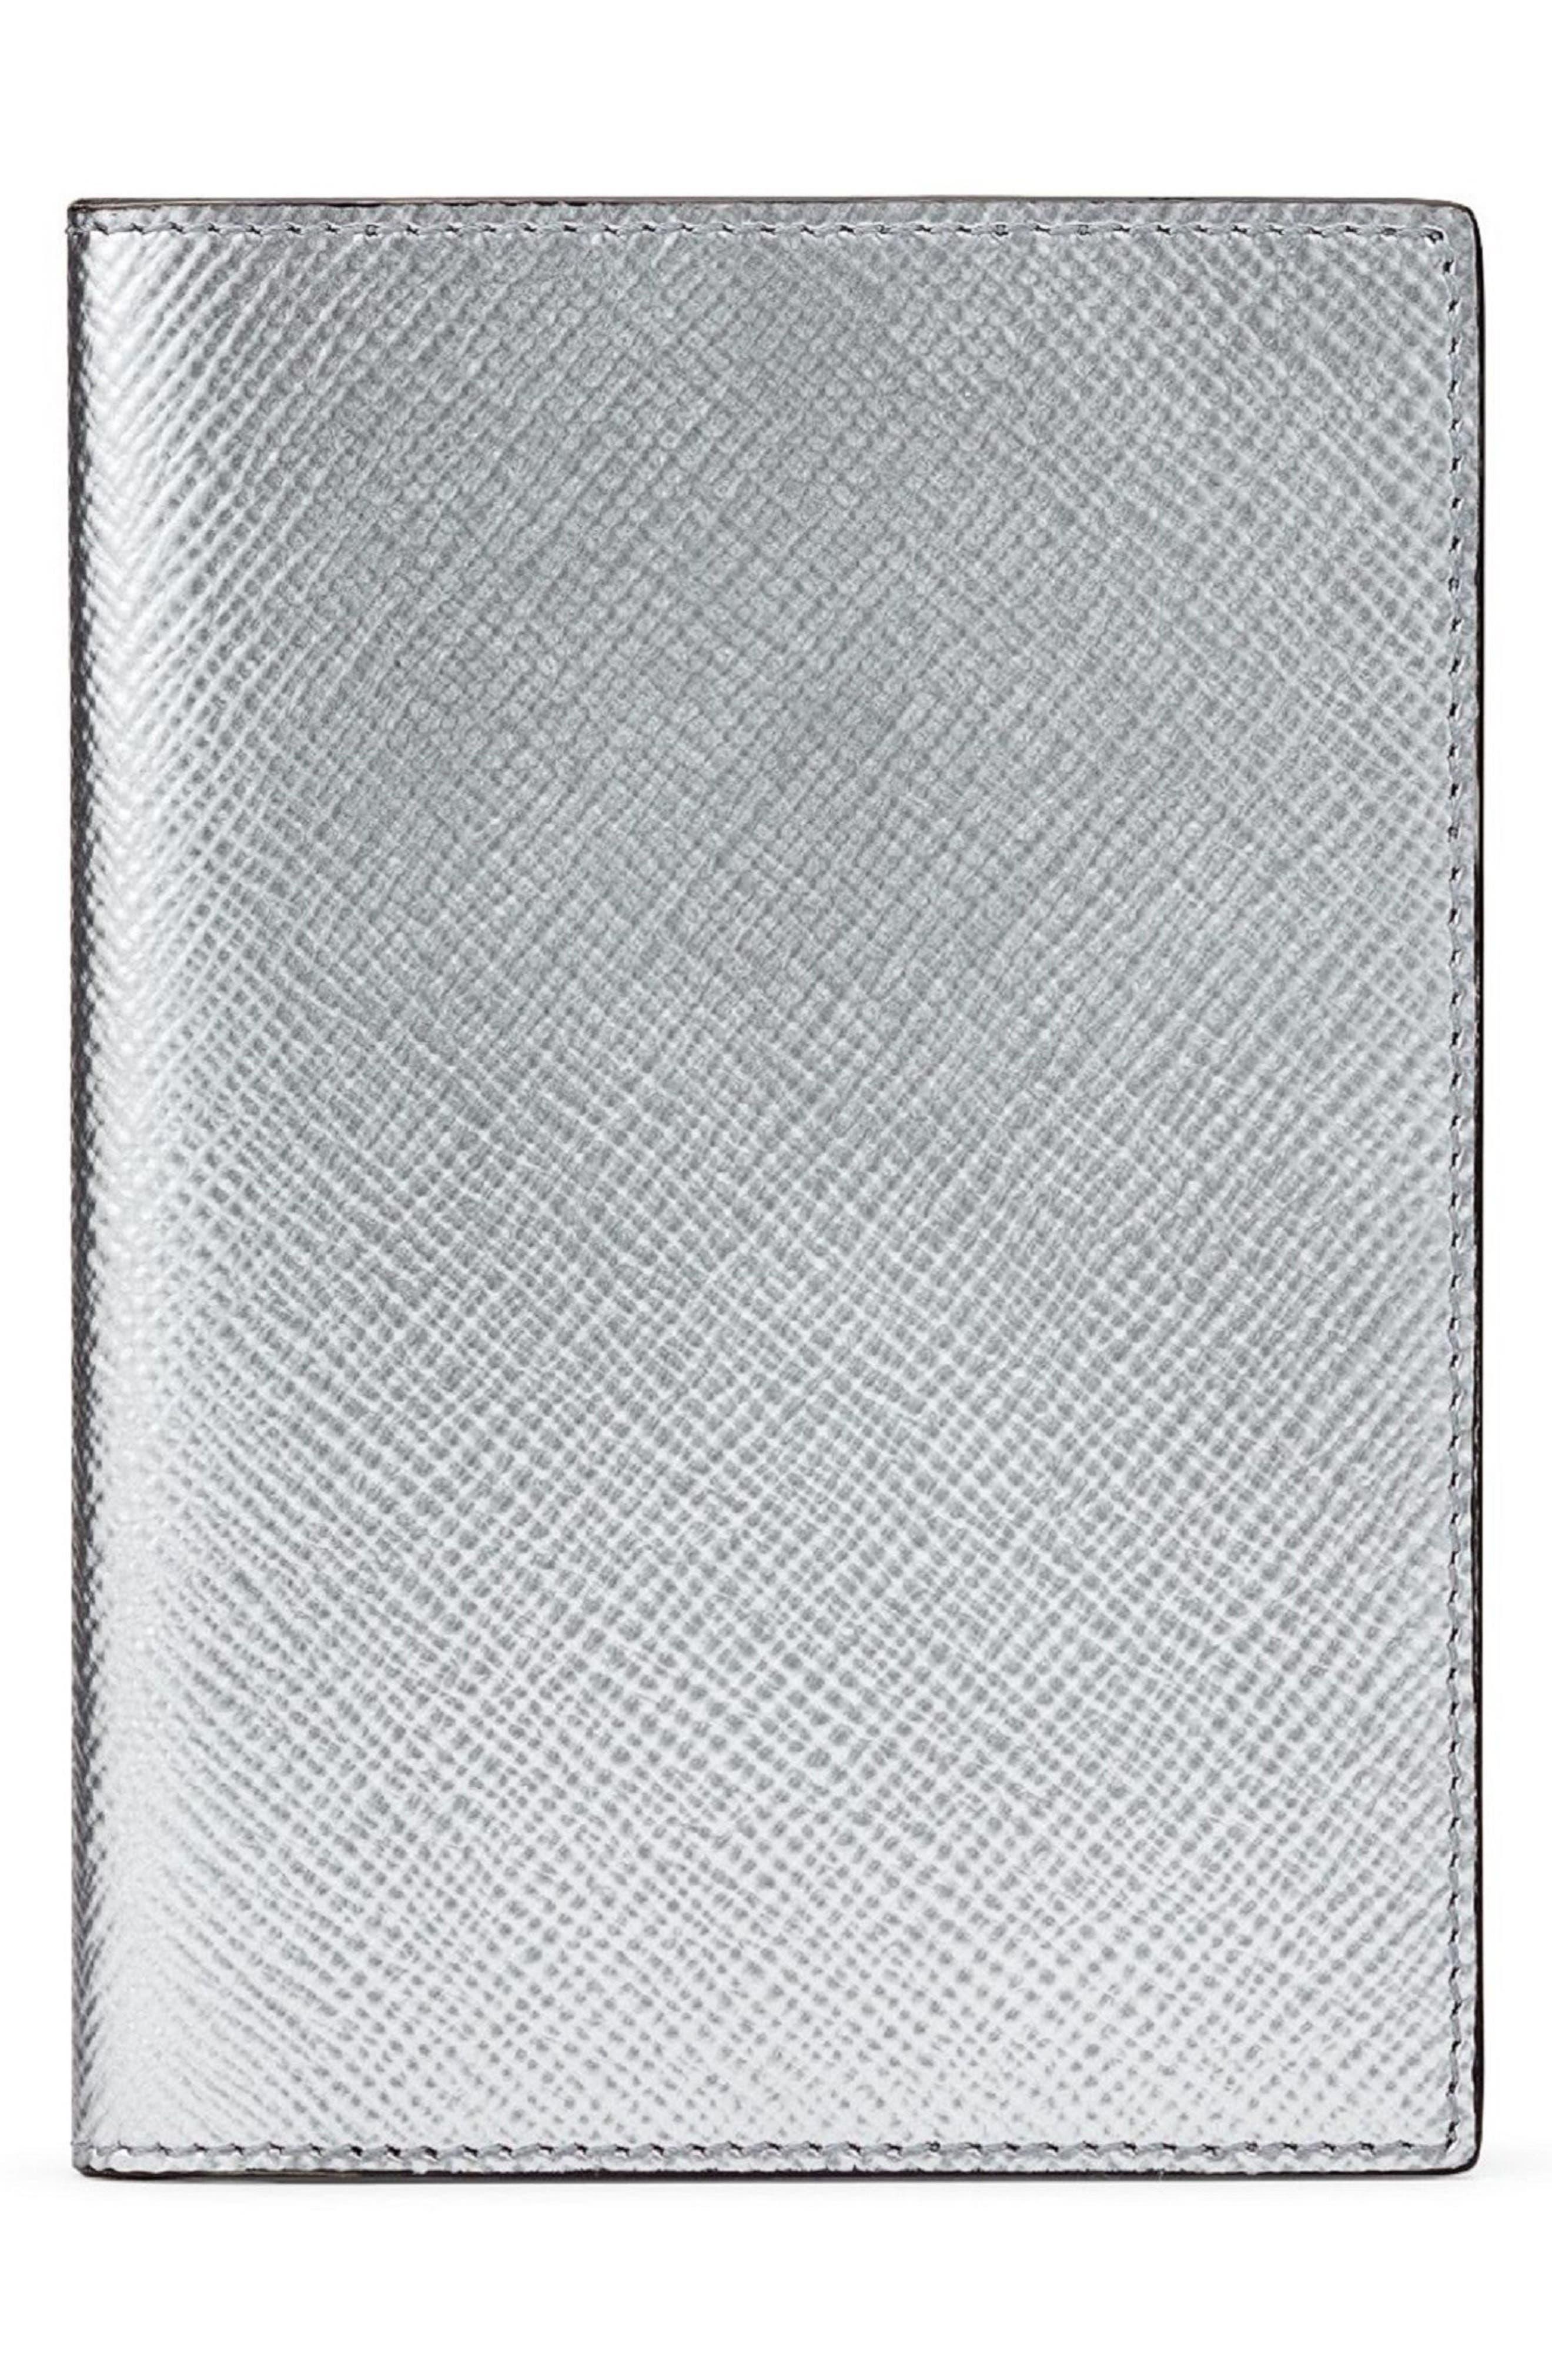 Panama Calfskin Leather Passport Case,                         Main,                         color,